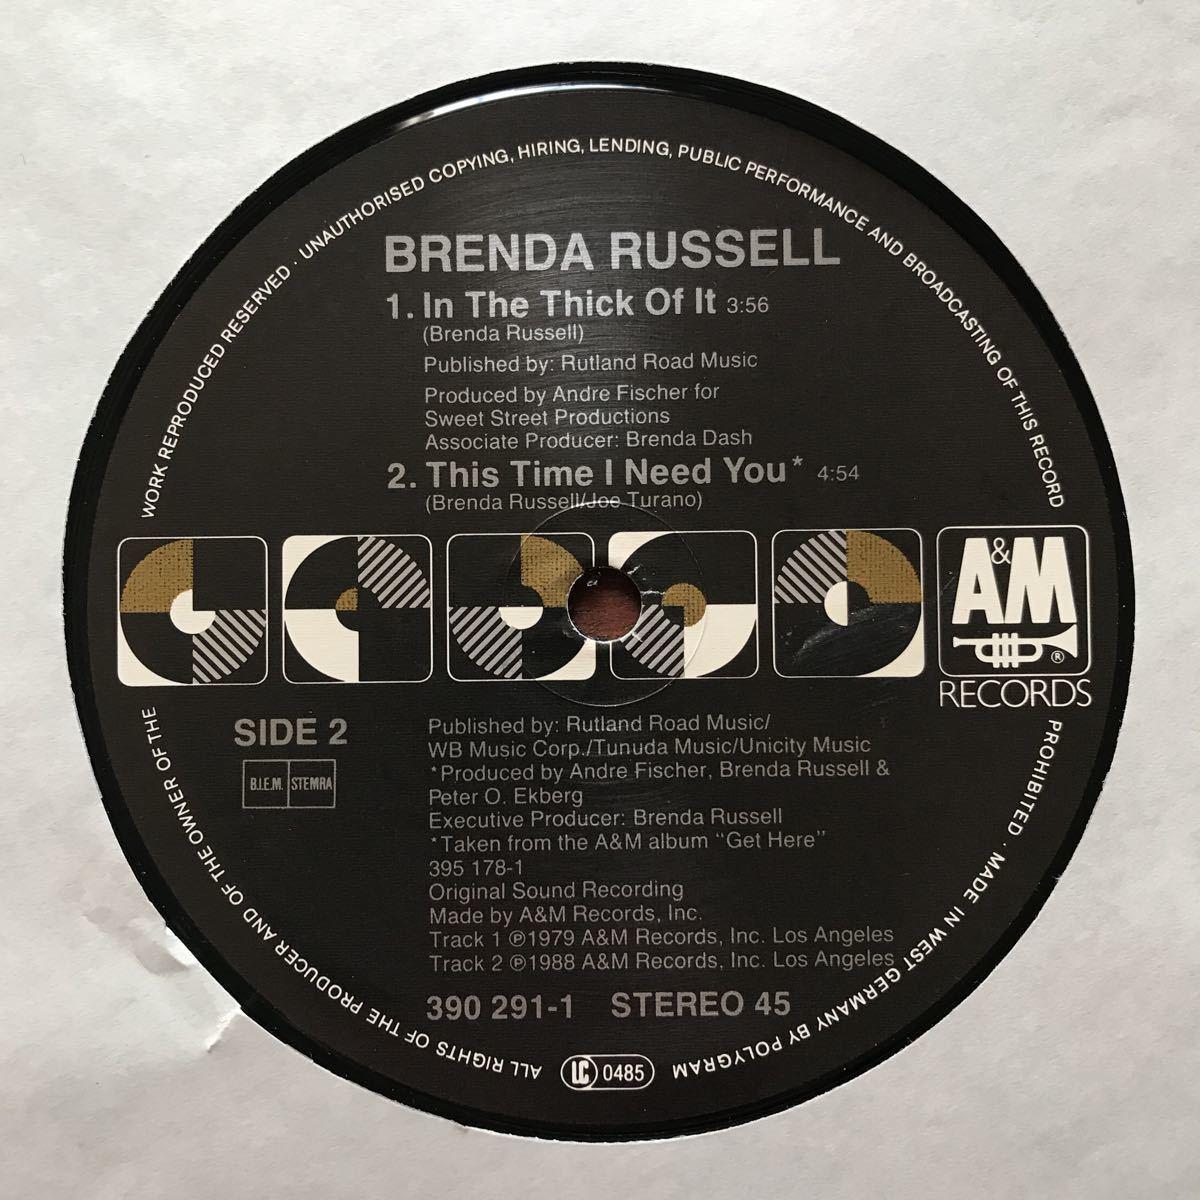 ●【r&b】Brenda Russell / Piano In The Dark[12inch]オリジナル盤《2-1-13 9595》